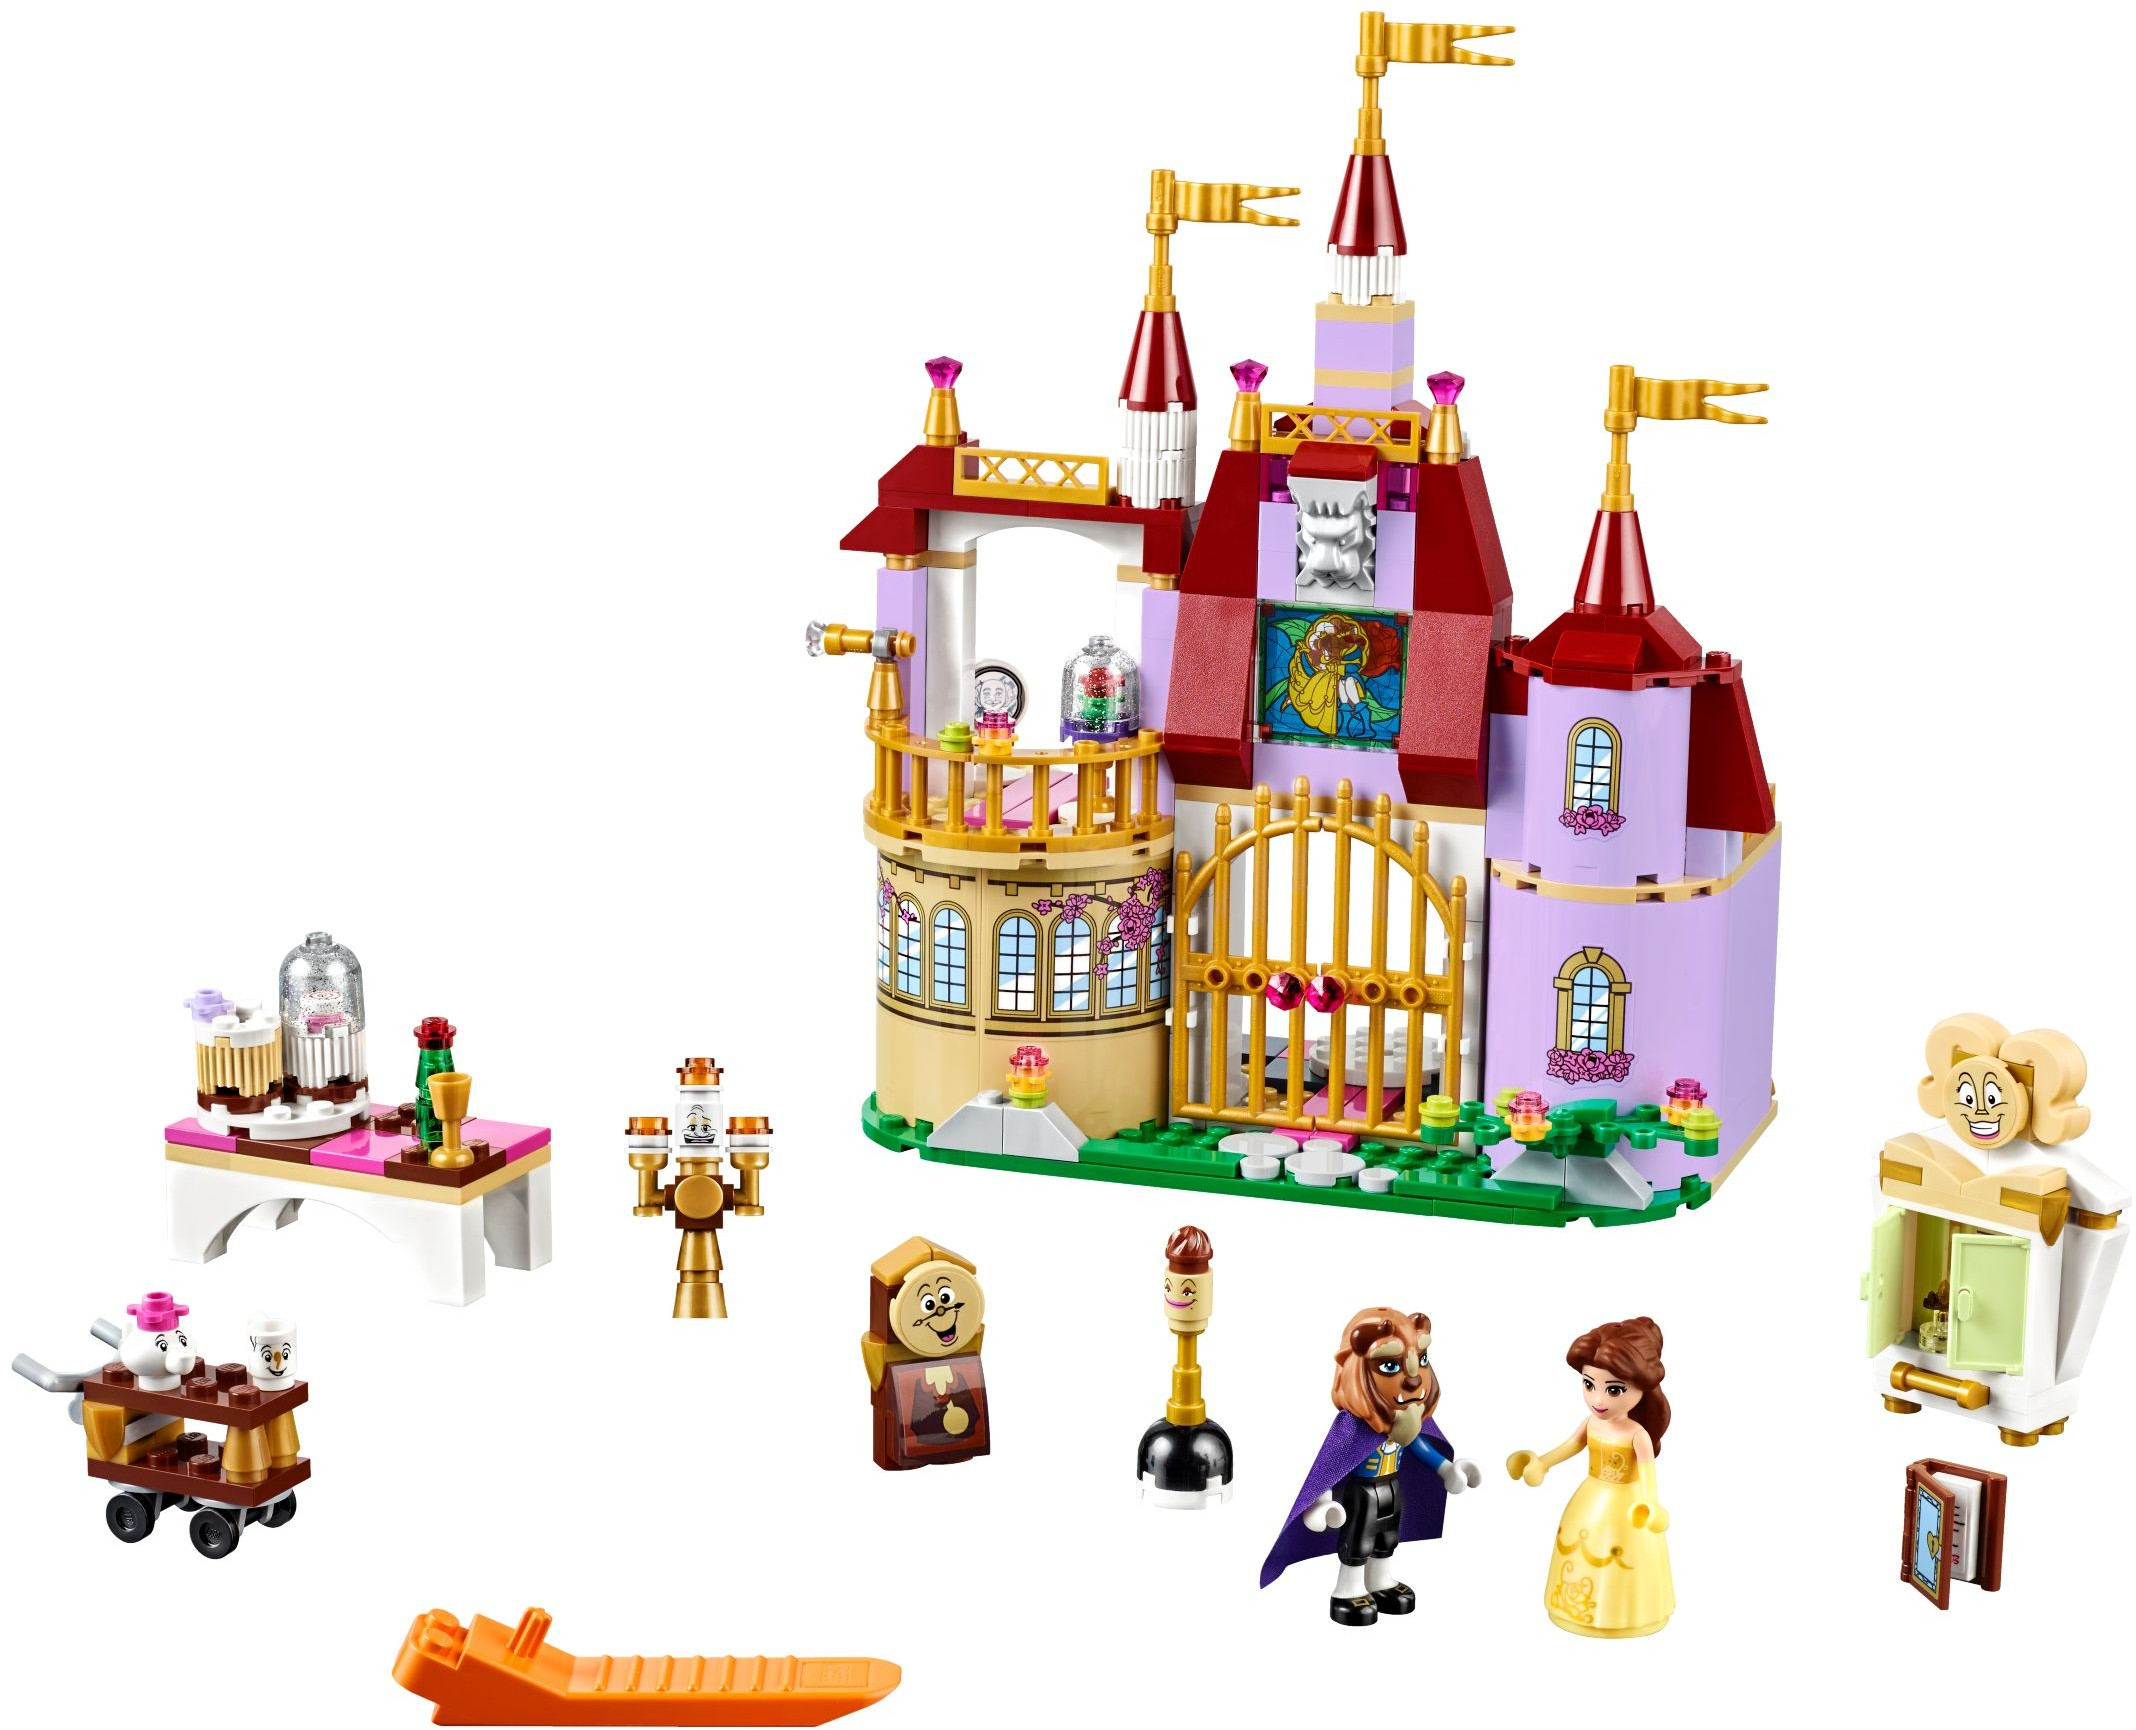 41067 LEGO Disney Princess Belle's Enchanted Castle